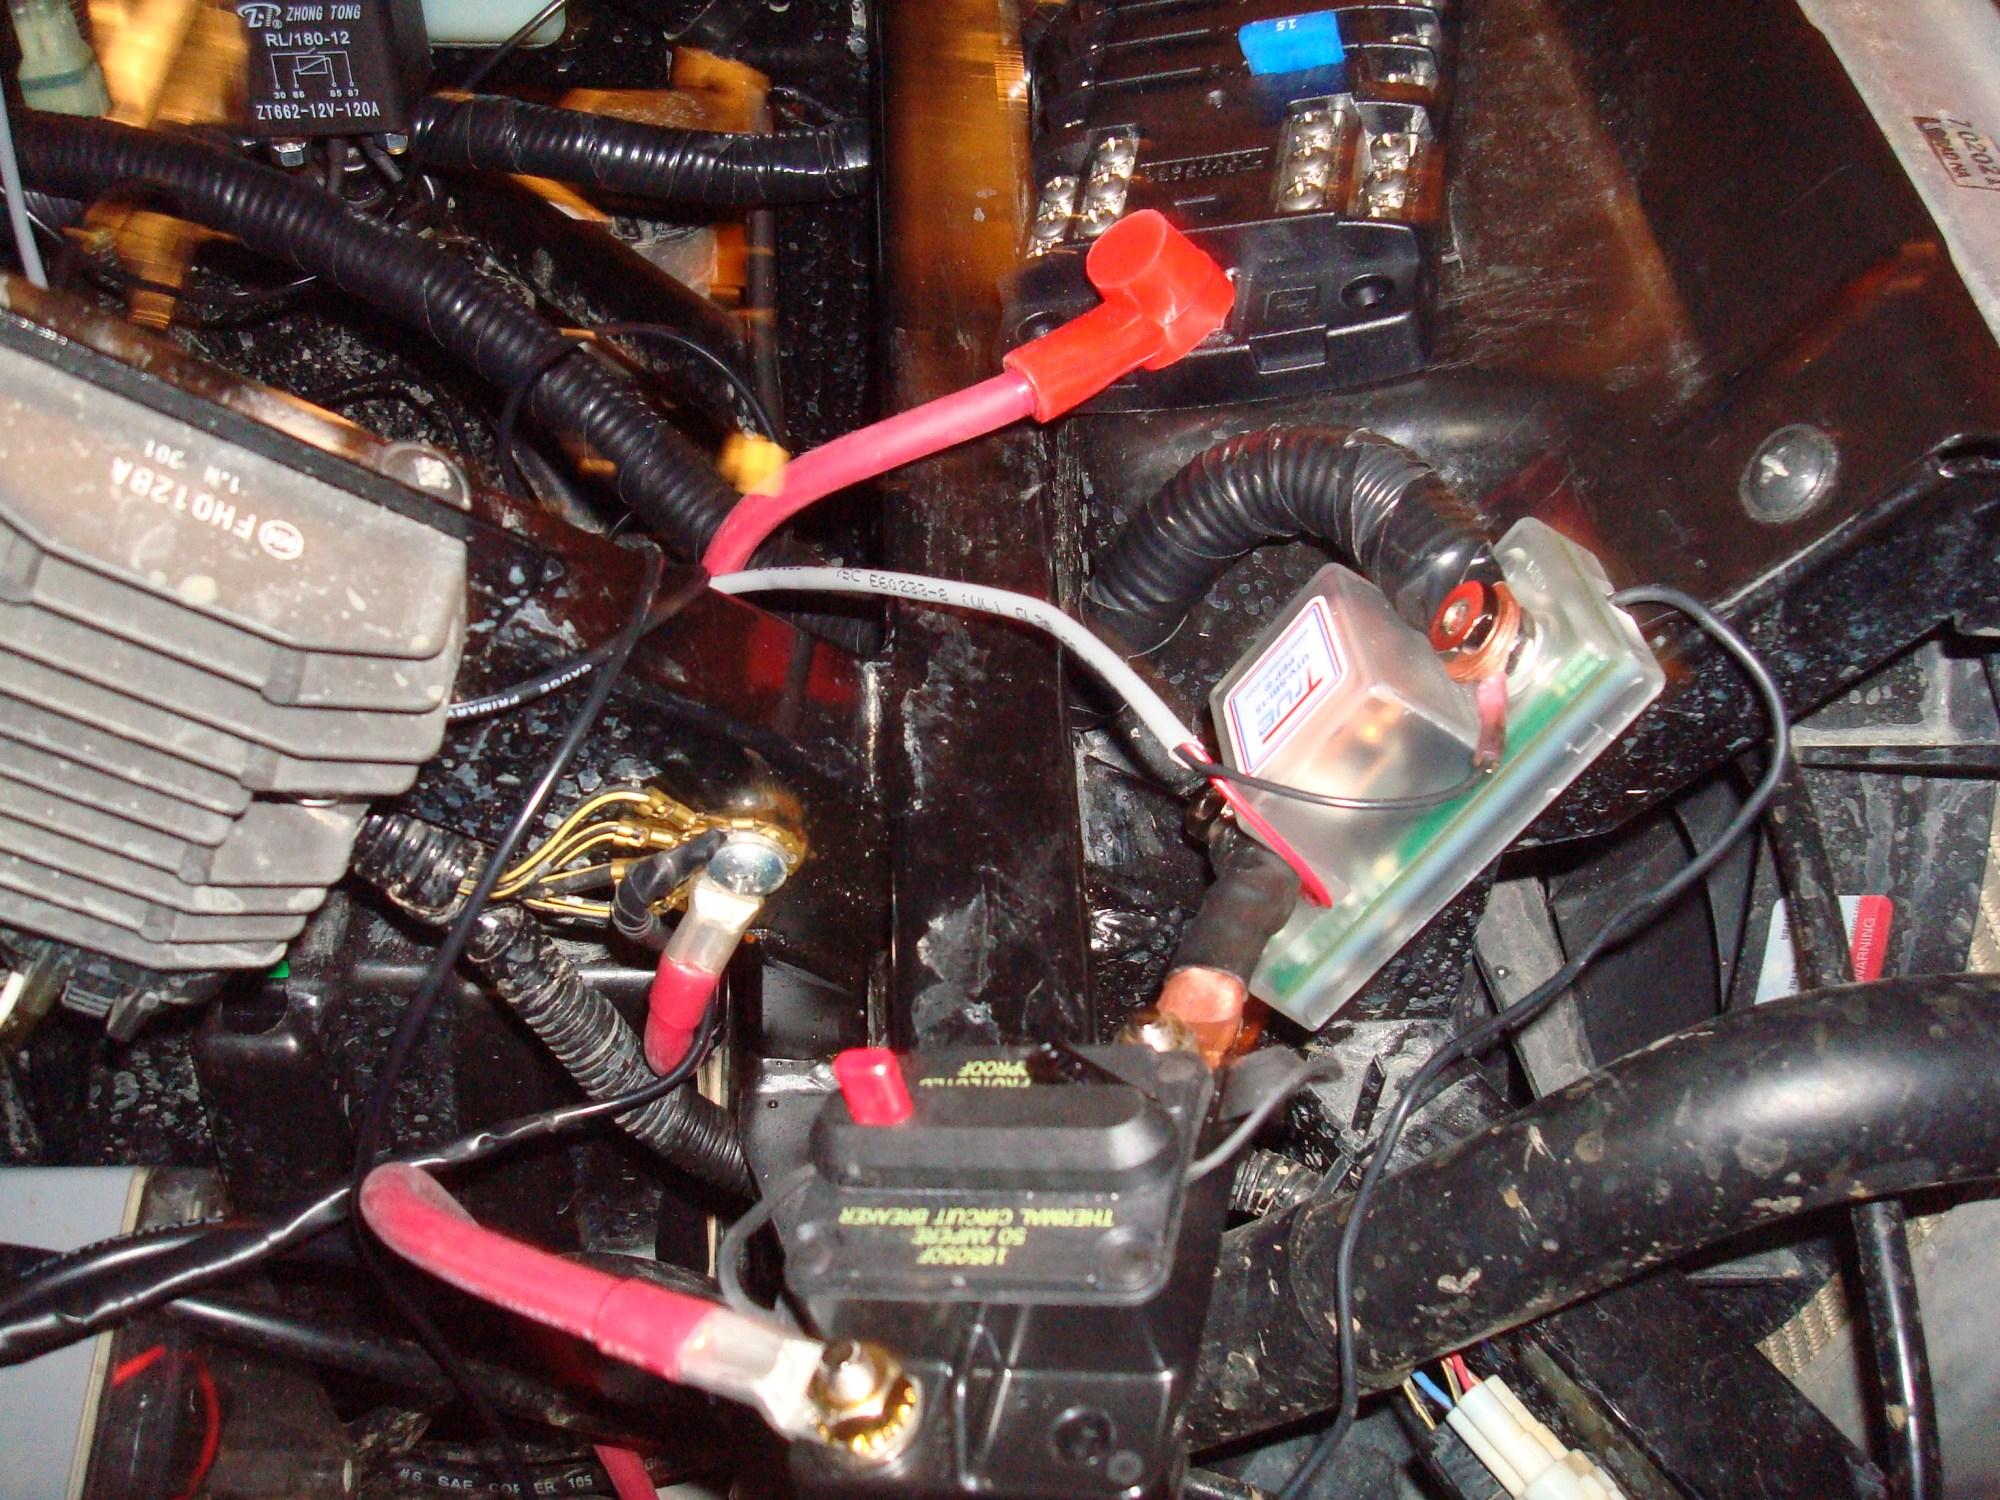 hight resolution of teryx 4 2012 battery 2 fuse box kawasaki teryx forumclick image for larger version name